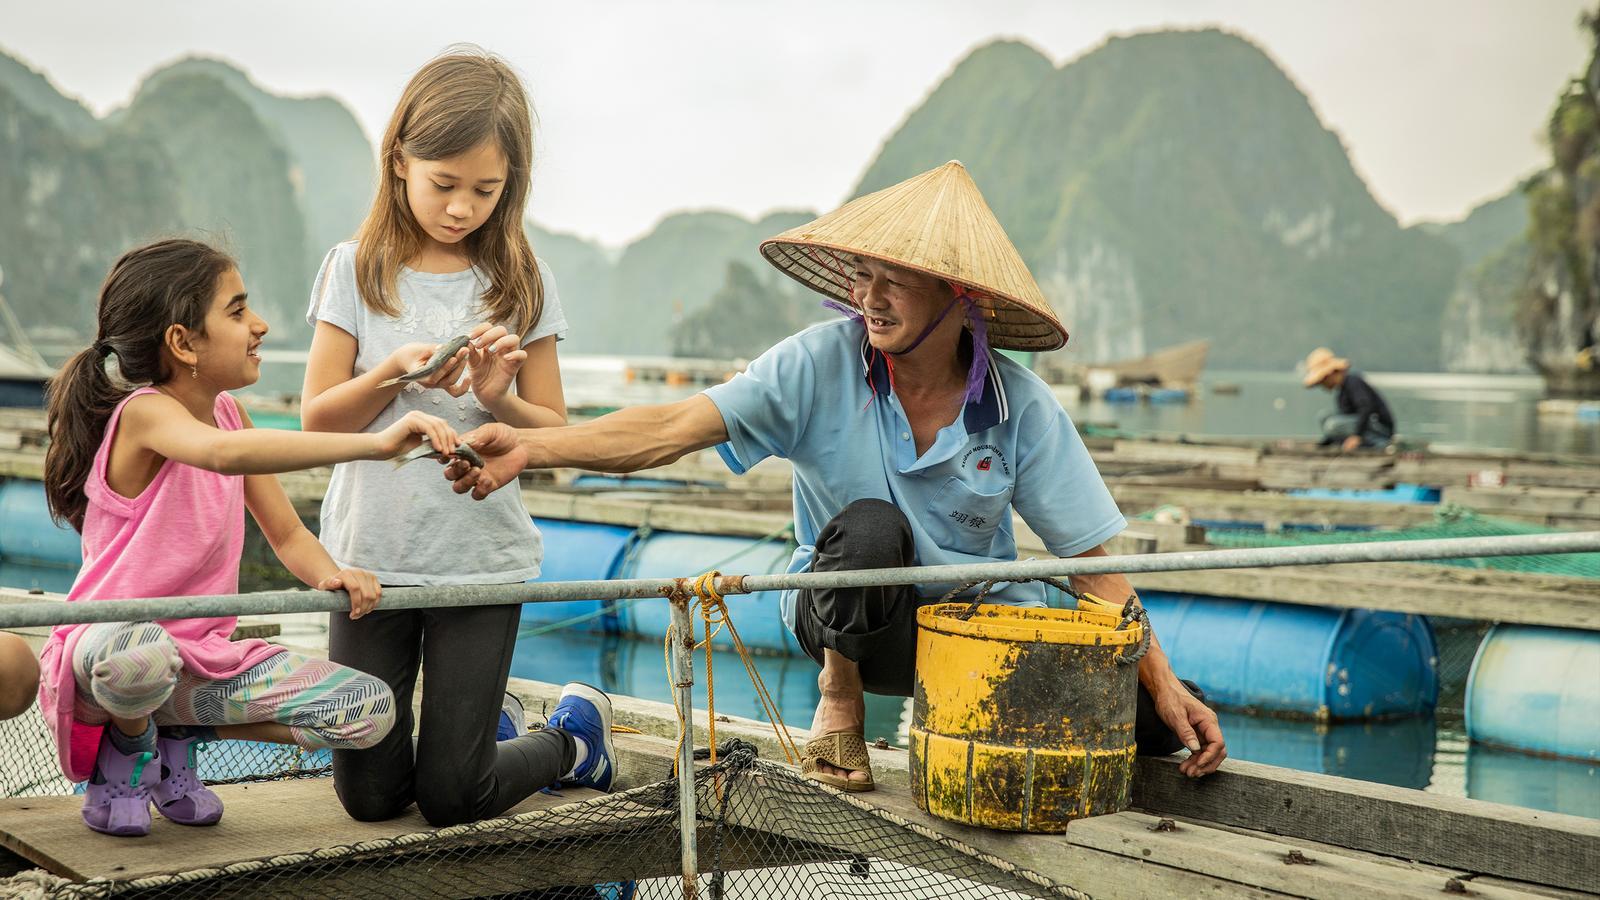 c6590fc2cbd Southeast Asia Family Journey  Vietnam to Cambodia in Vietnam